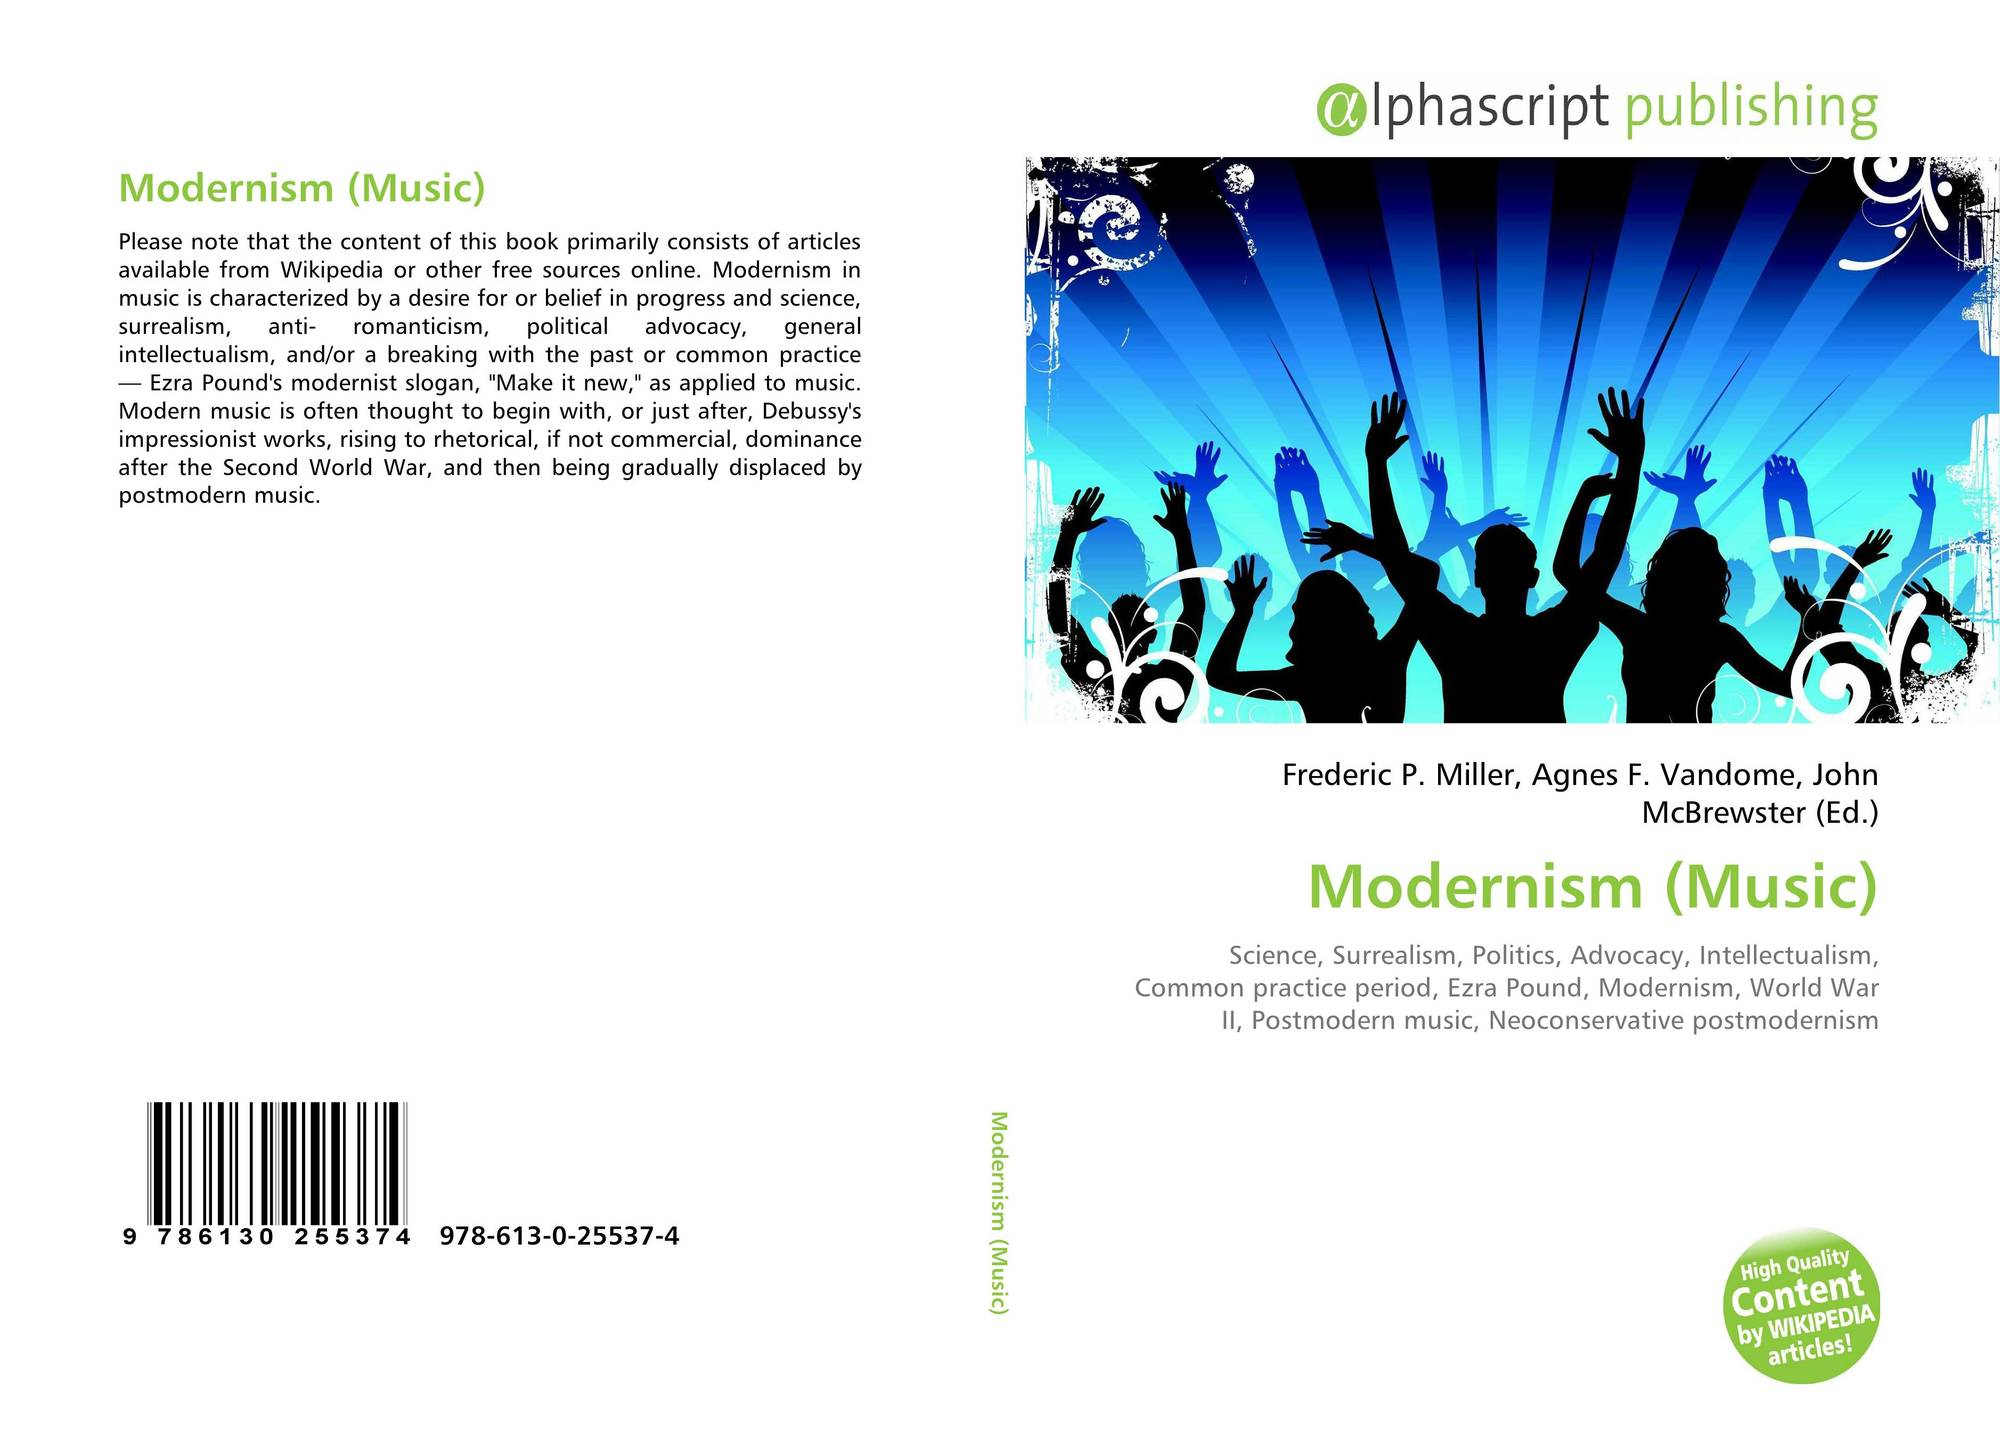 Modernism (Music), 978-613-0-25537-4, 6130255373 ,9786130255374